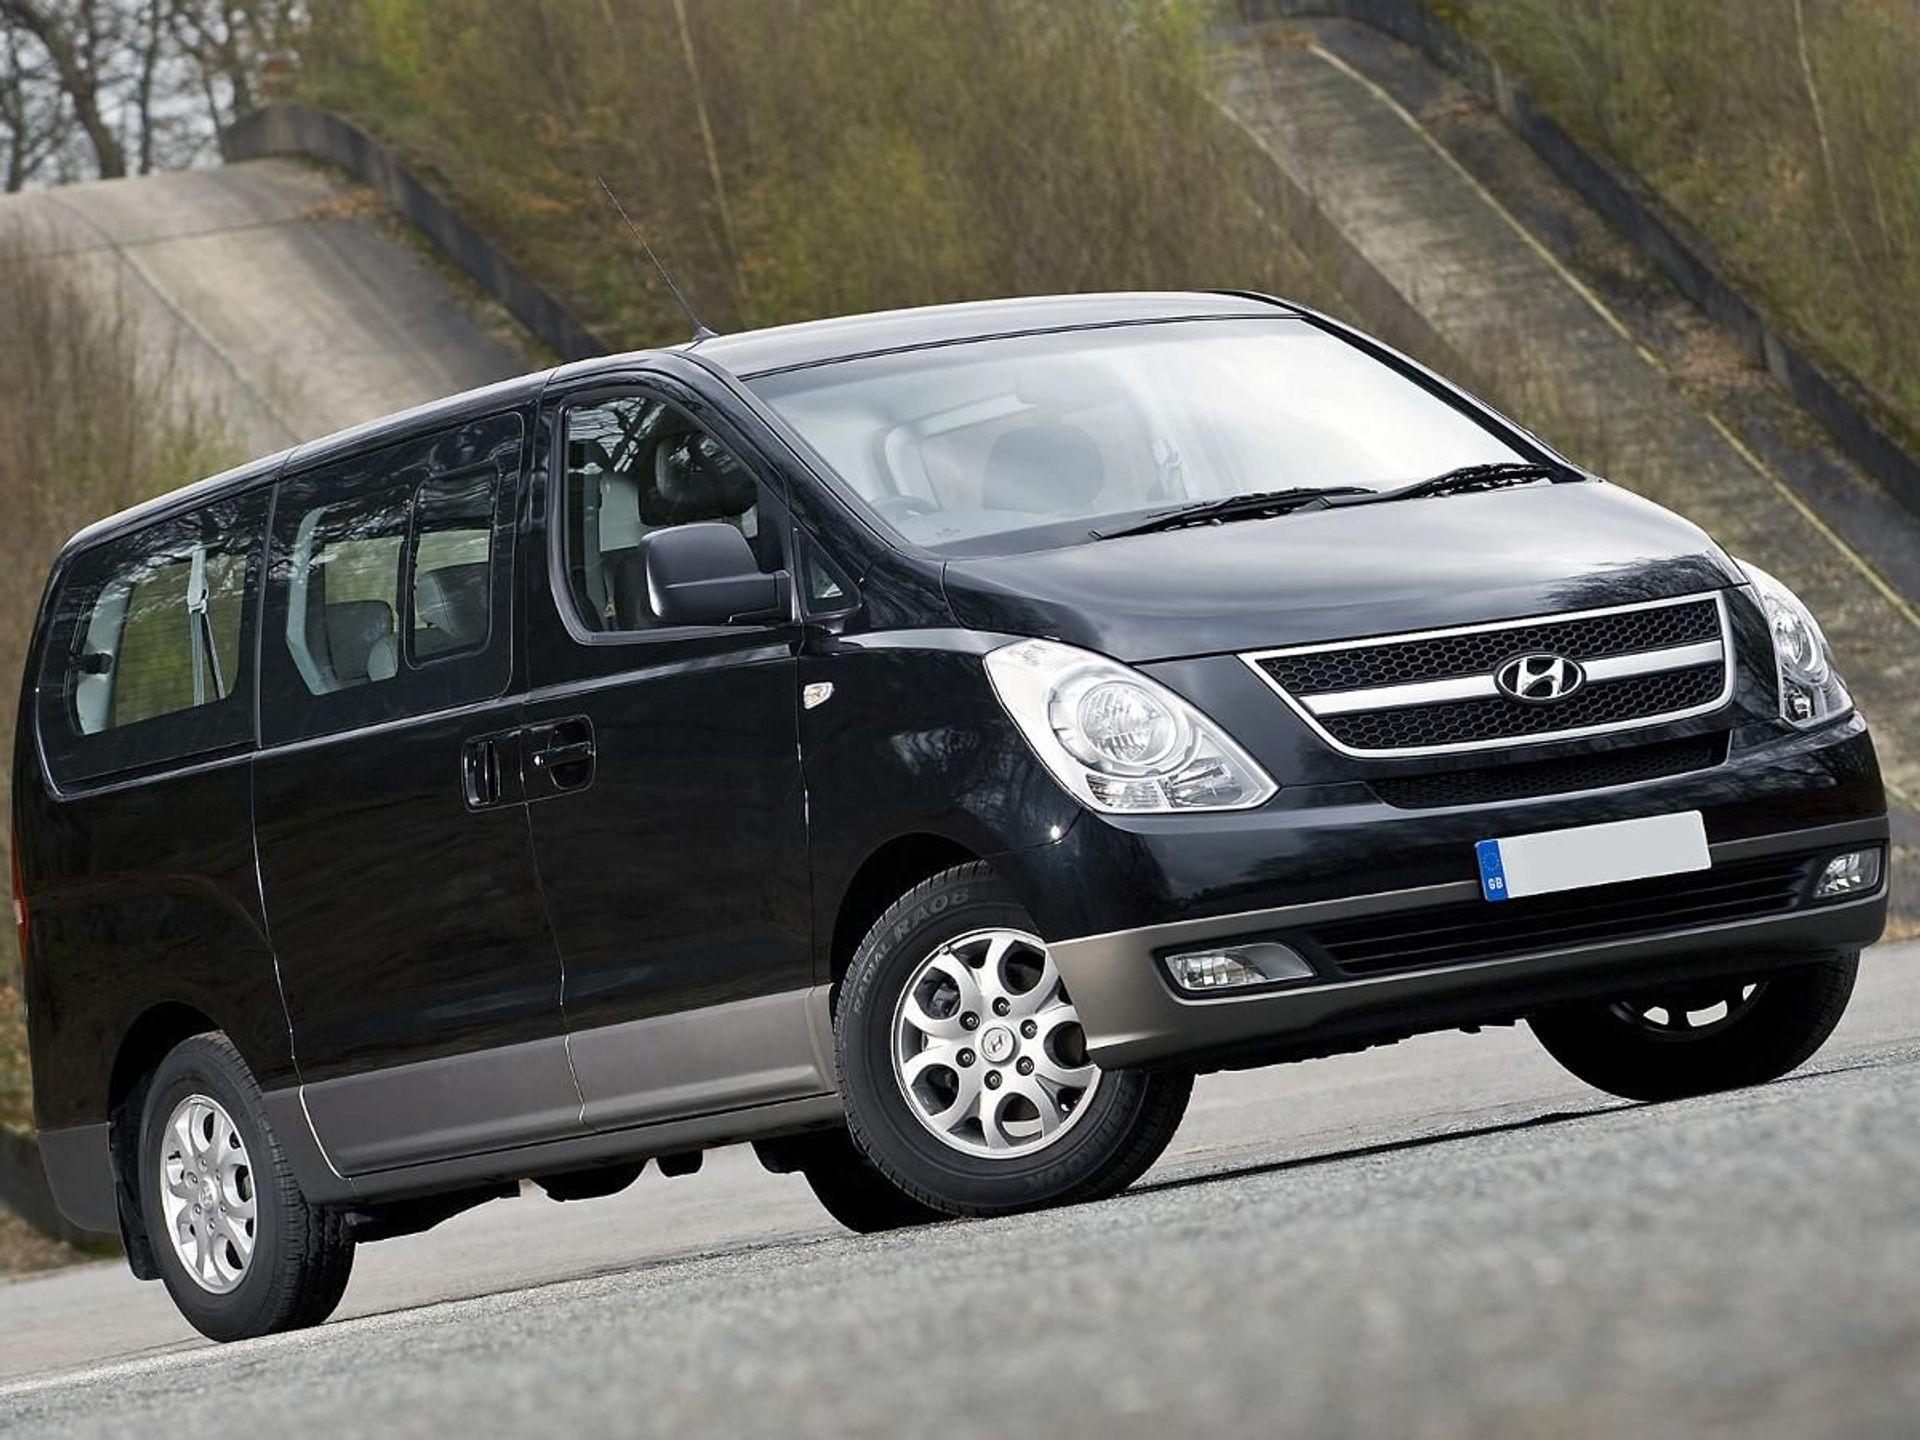 Hyundai i800  image